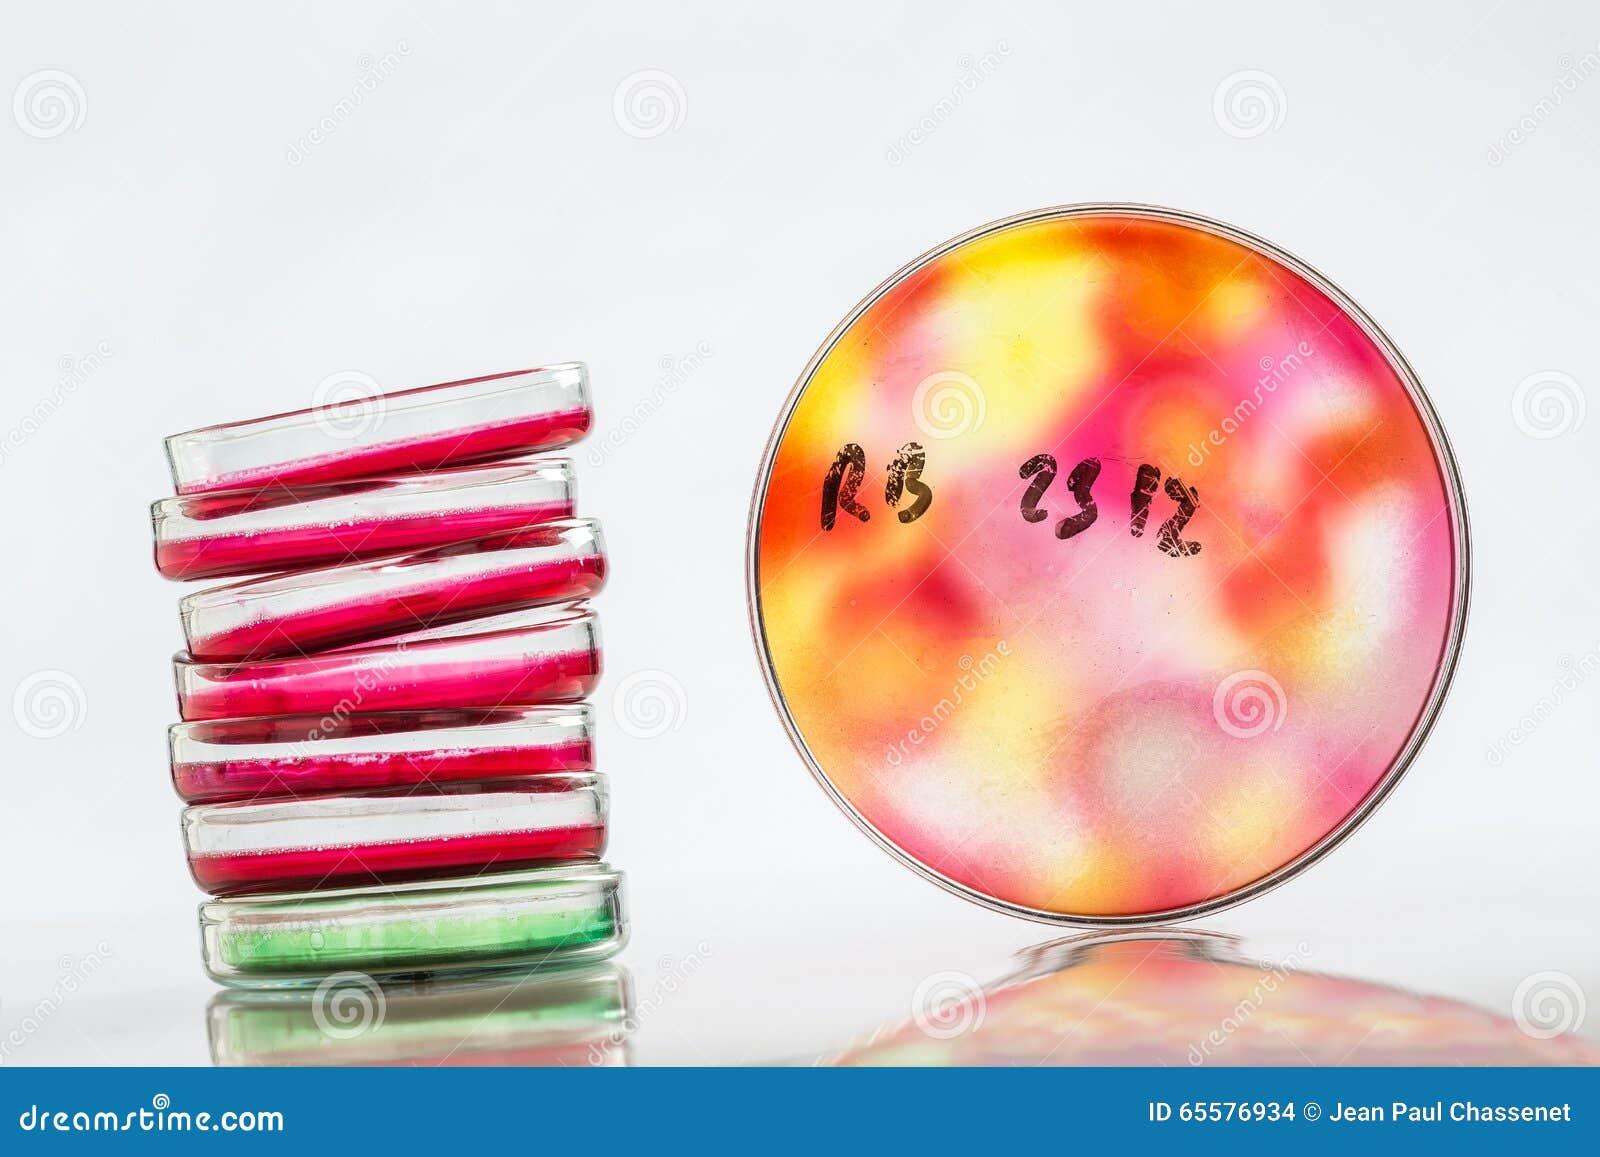 Prato de Petri, análise de sangue, tubo de ensaio, seringa